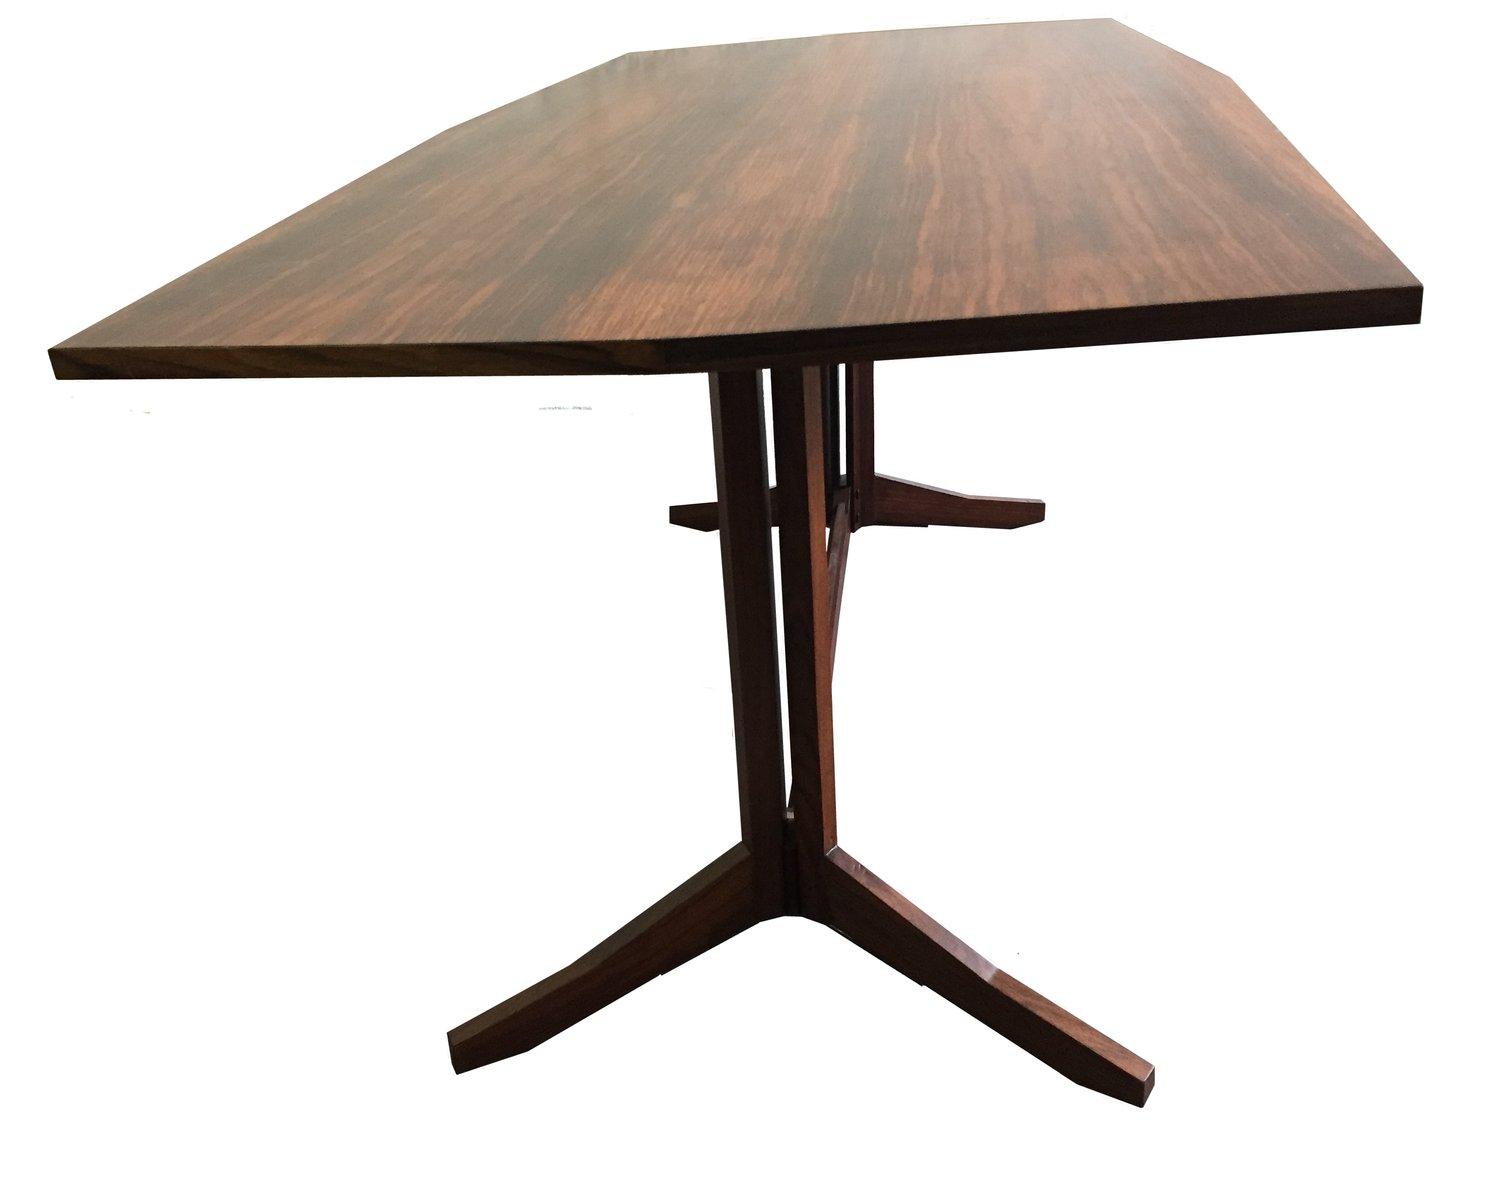 Table de salle manger en bois italie en vente sur pamono for Table de salle a manger 3 metres